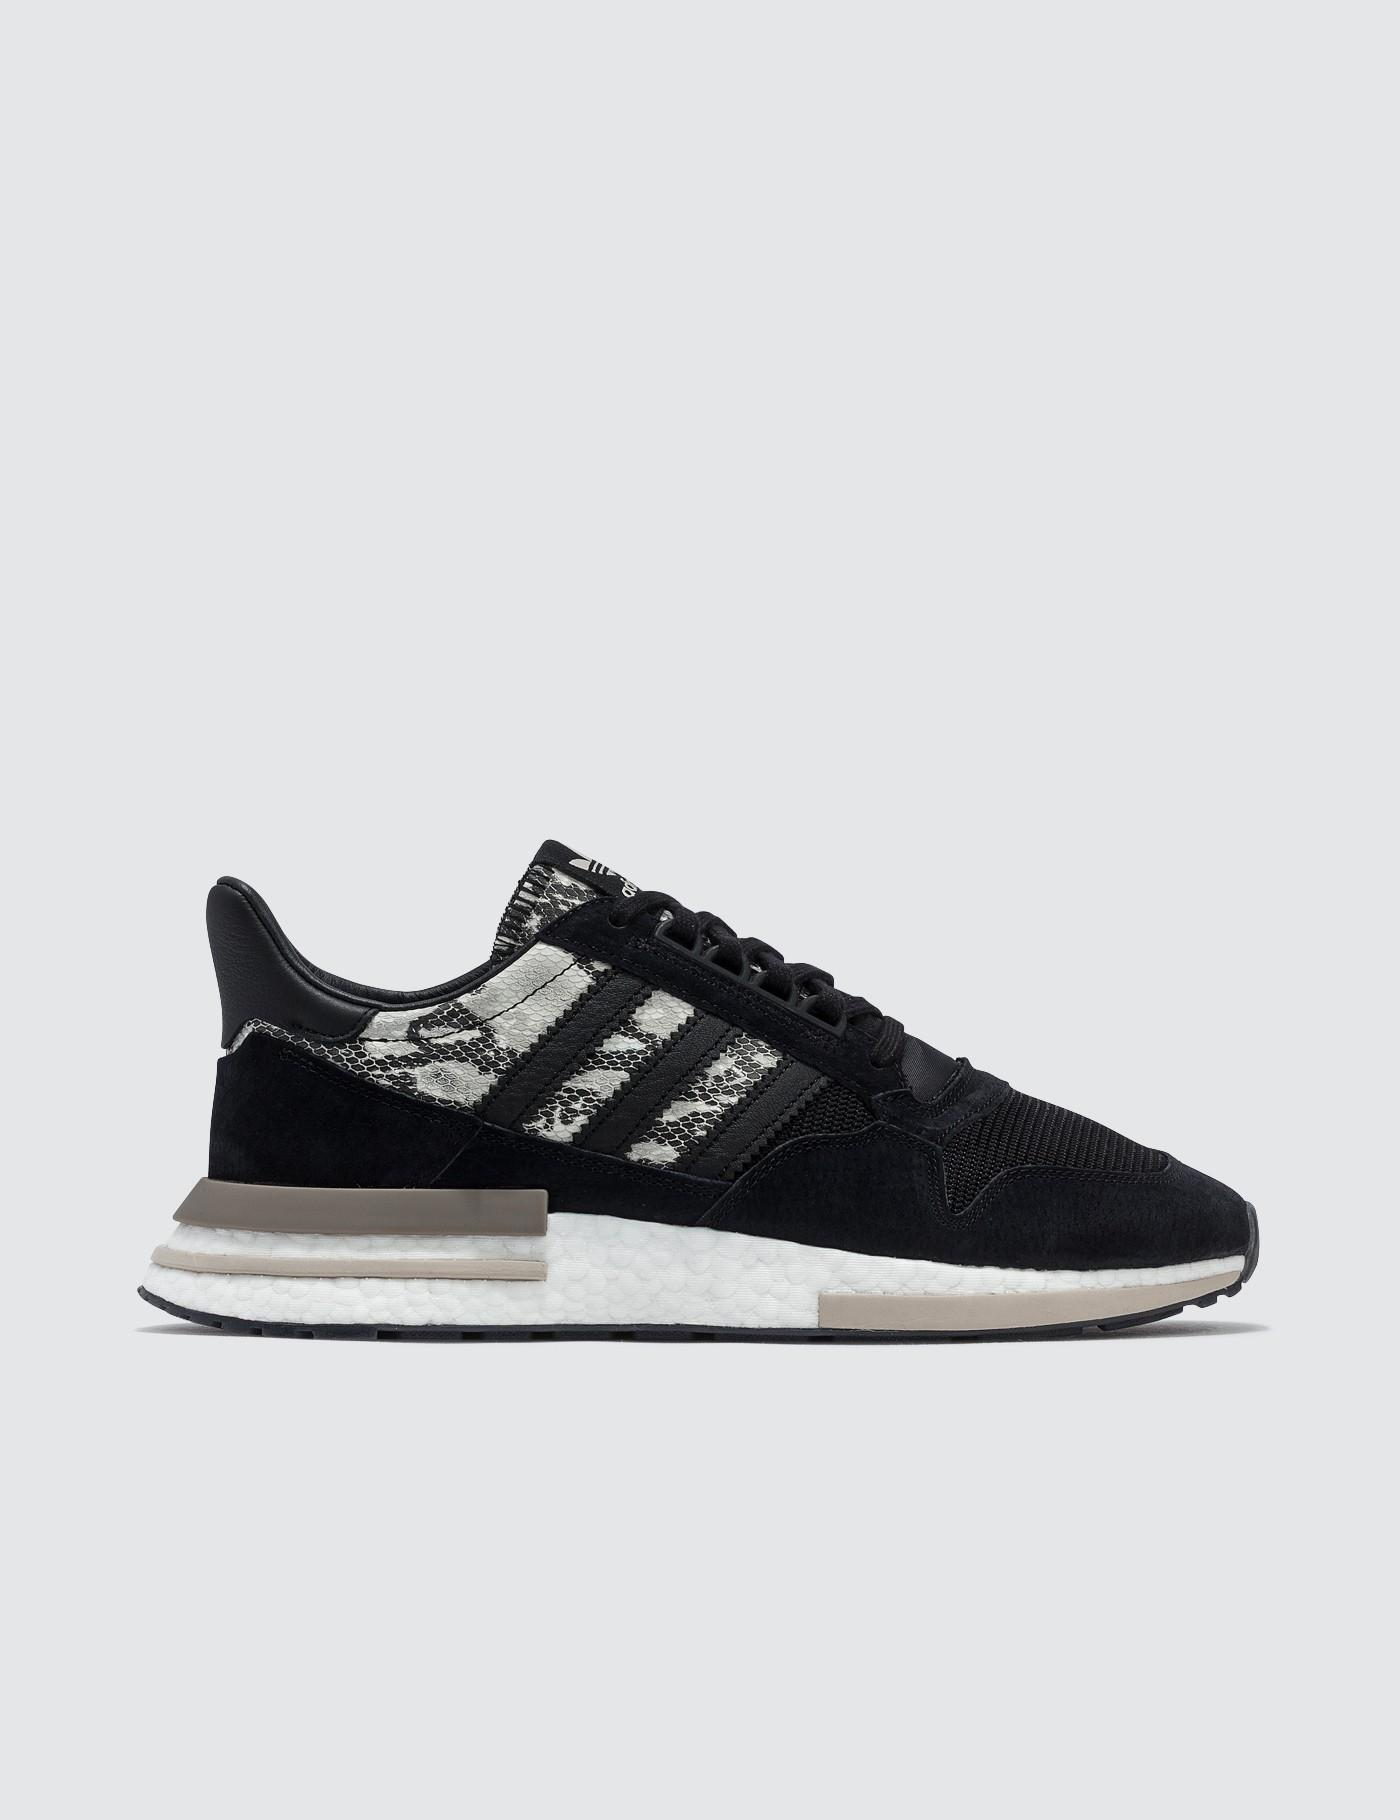 9361a445f adidas Originals Zx 500 Rm in Black for Men - Lyst